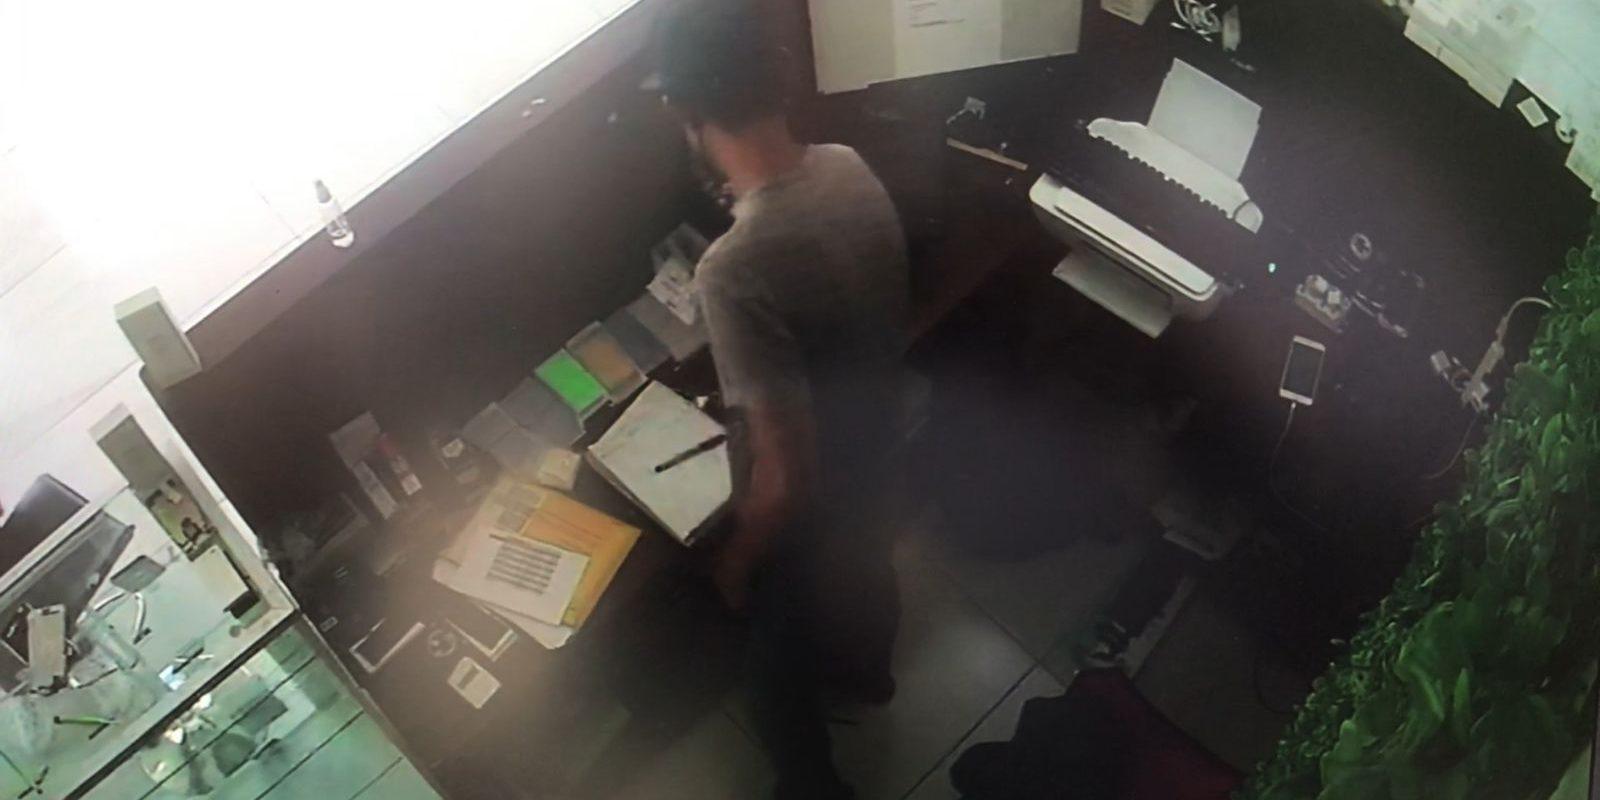 Va FGE por asaltantes de tienda de celulares en Monclova